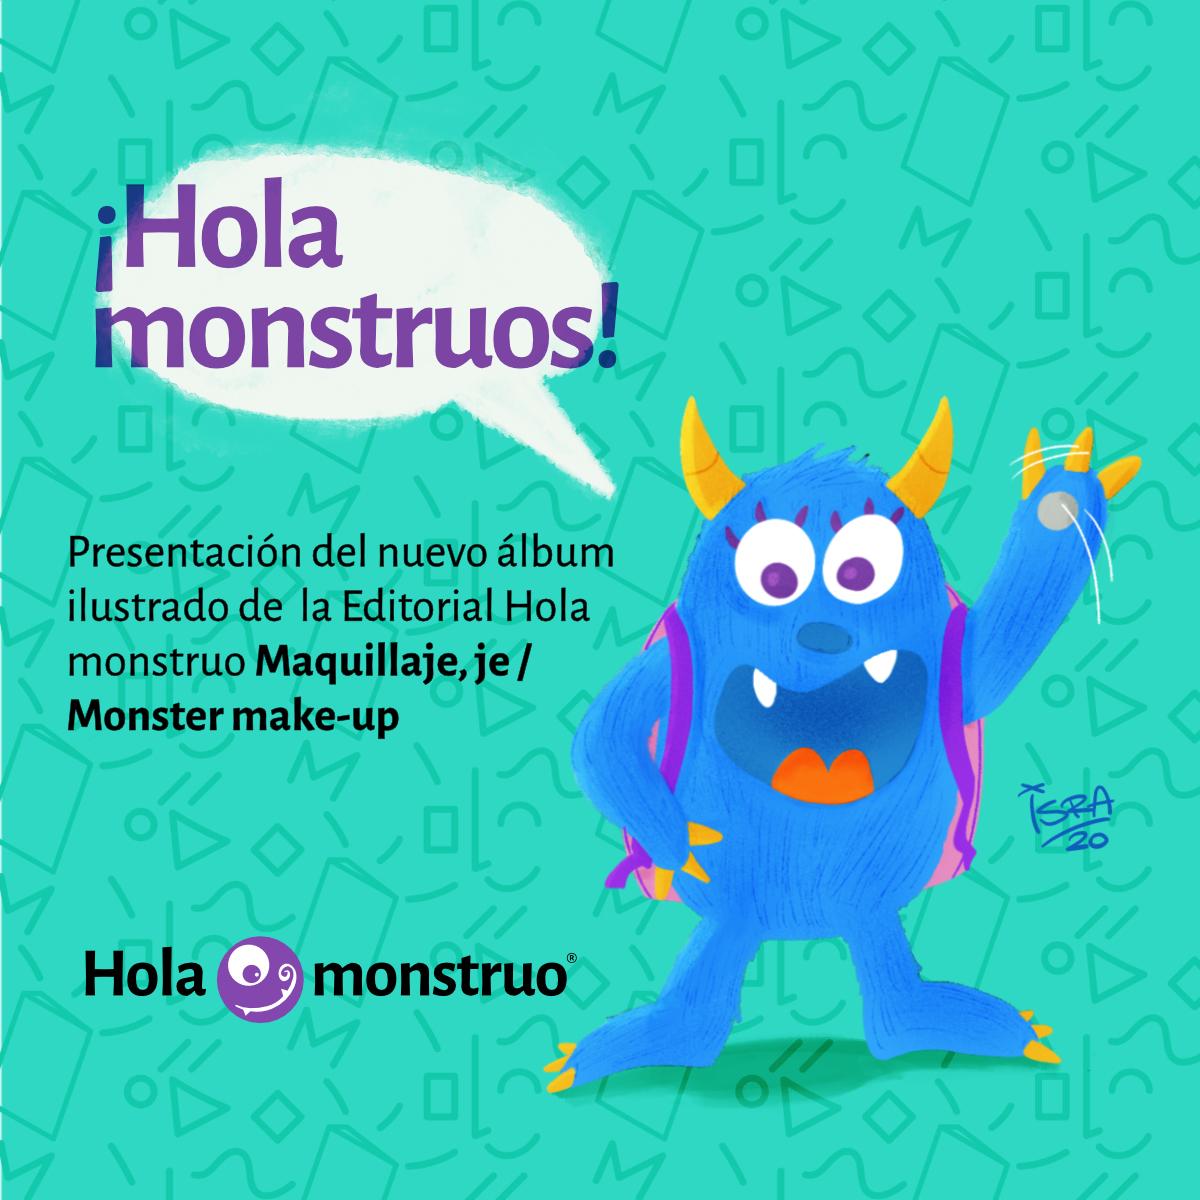 Hola monstruos: Maquillaje, je